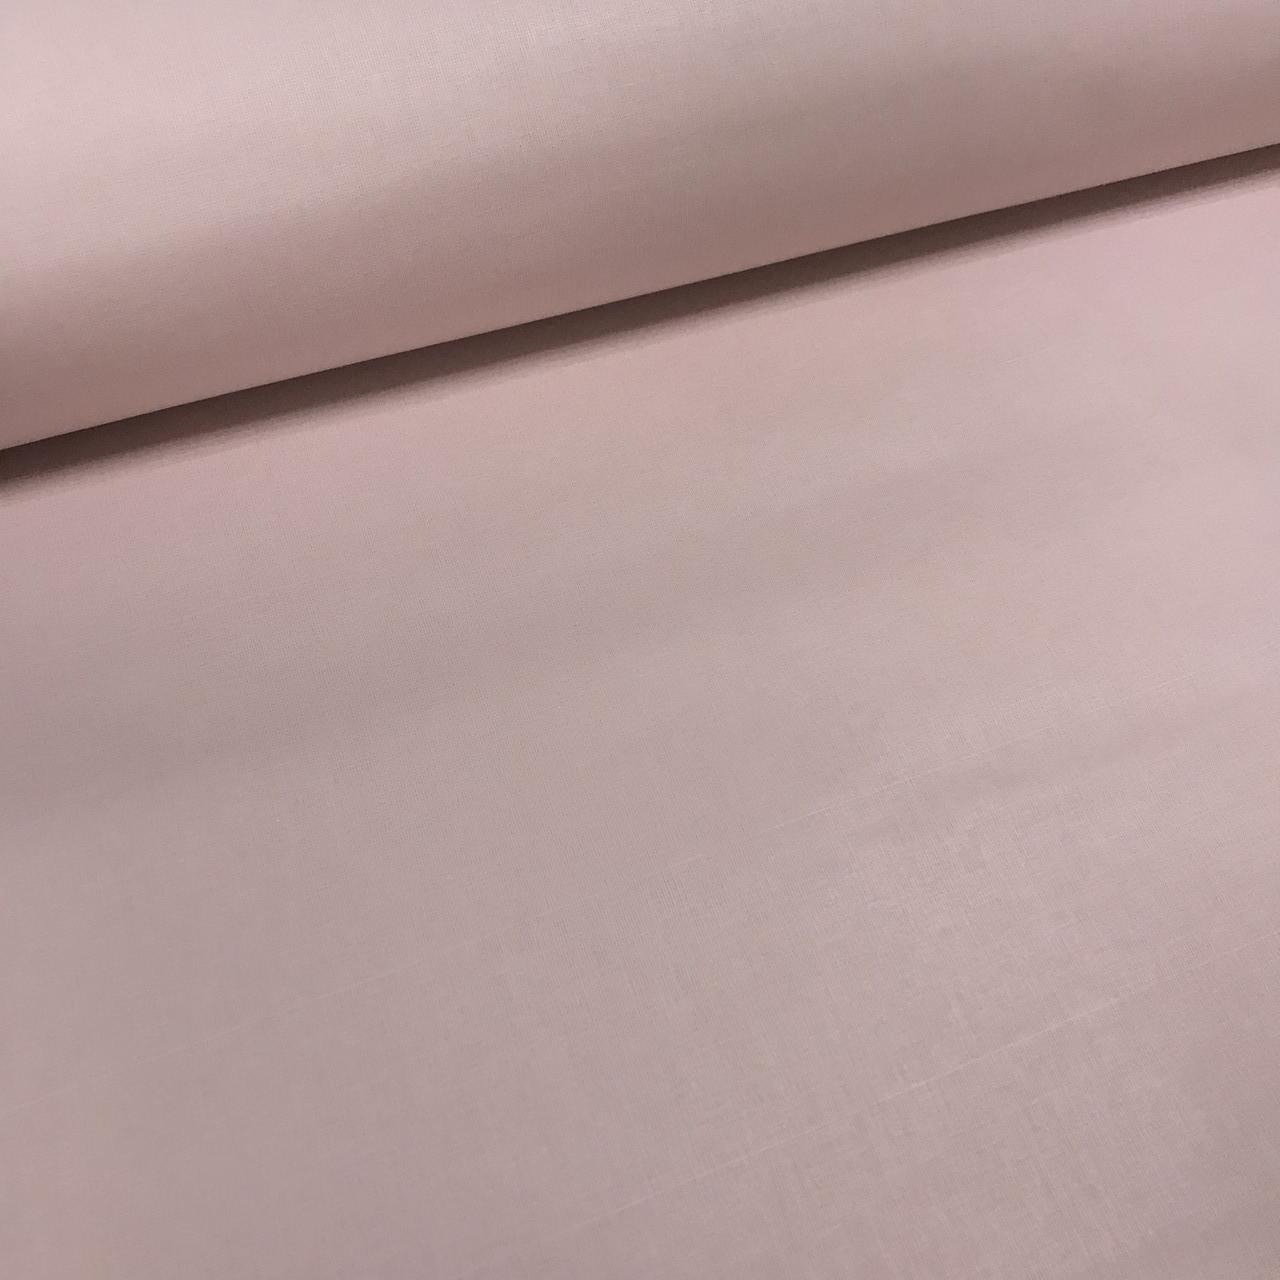 Хлопковая ткань однотонная темно-пудровая